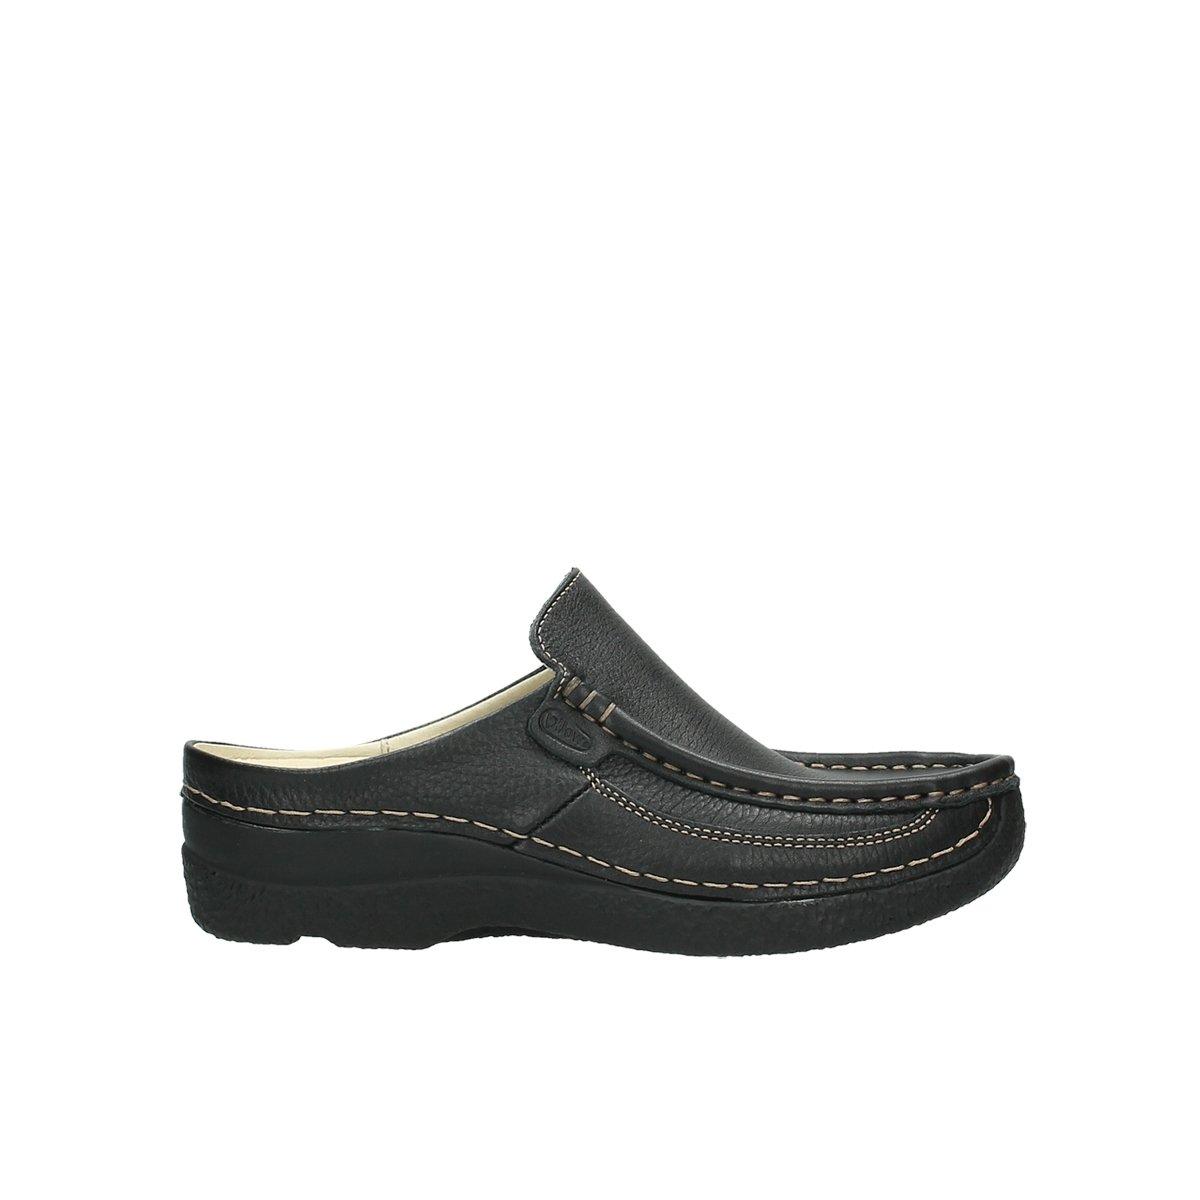 Wolky comodidad sandalias 06202 rollo diapositiva 40 EU 70000 Black Printed Leather